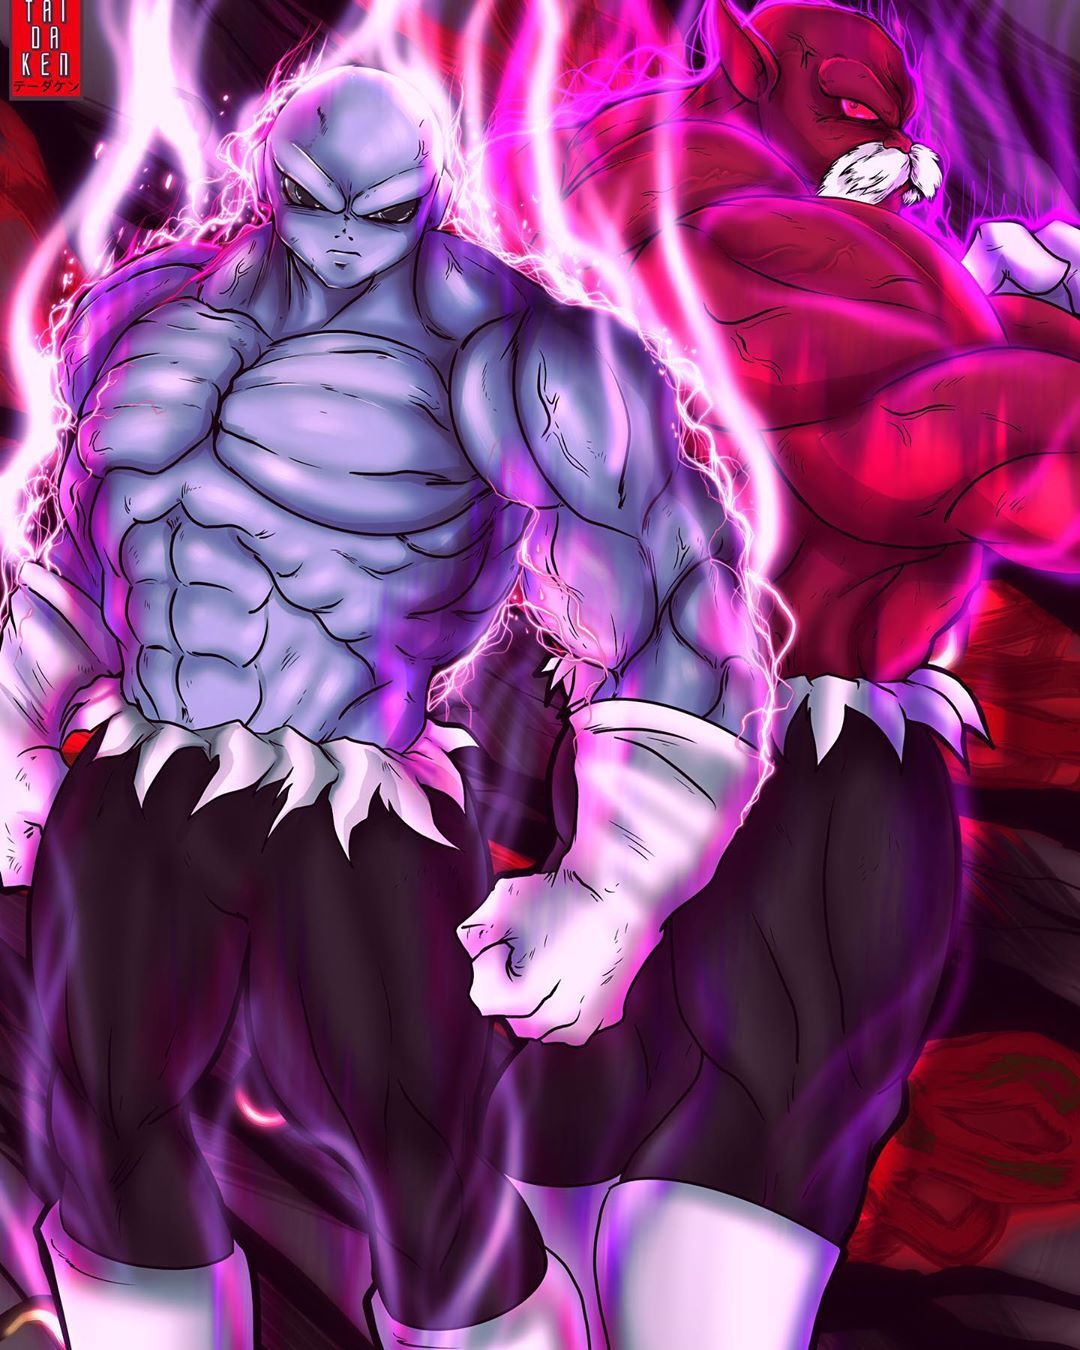 Pin By Rohangupte On Dragon Ball Super Anime Anime Art Fan Art